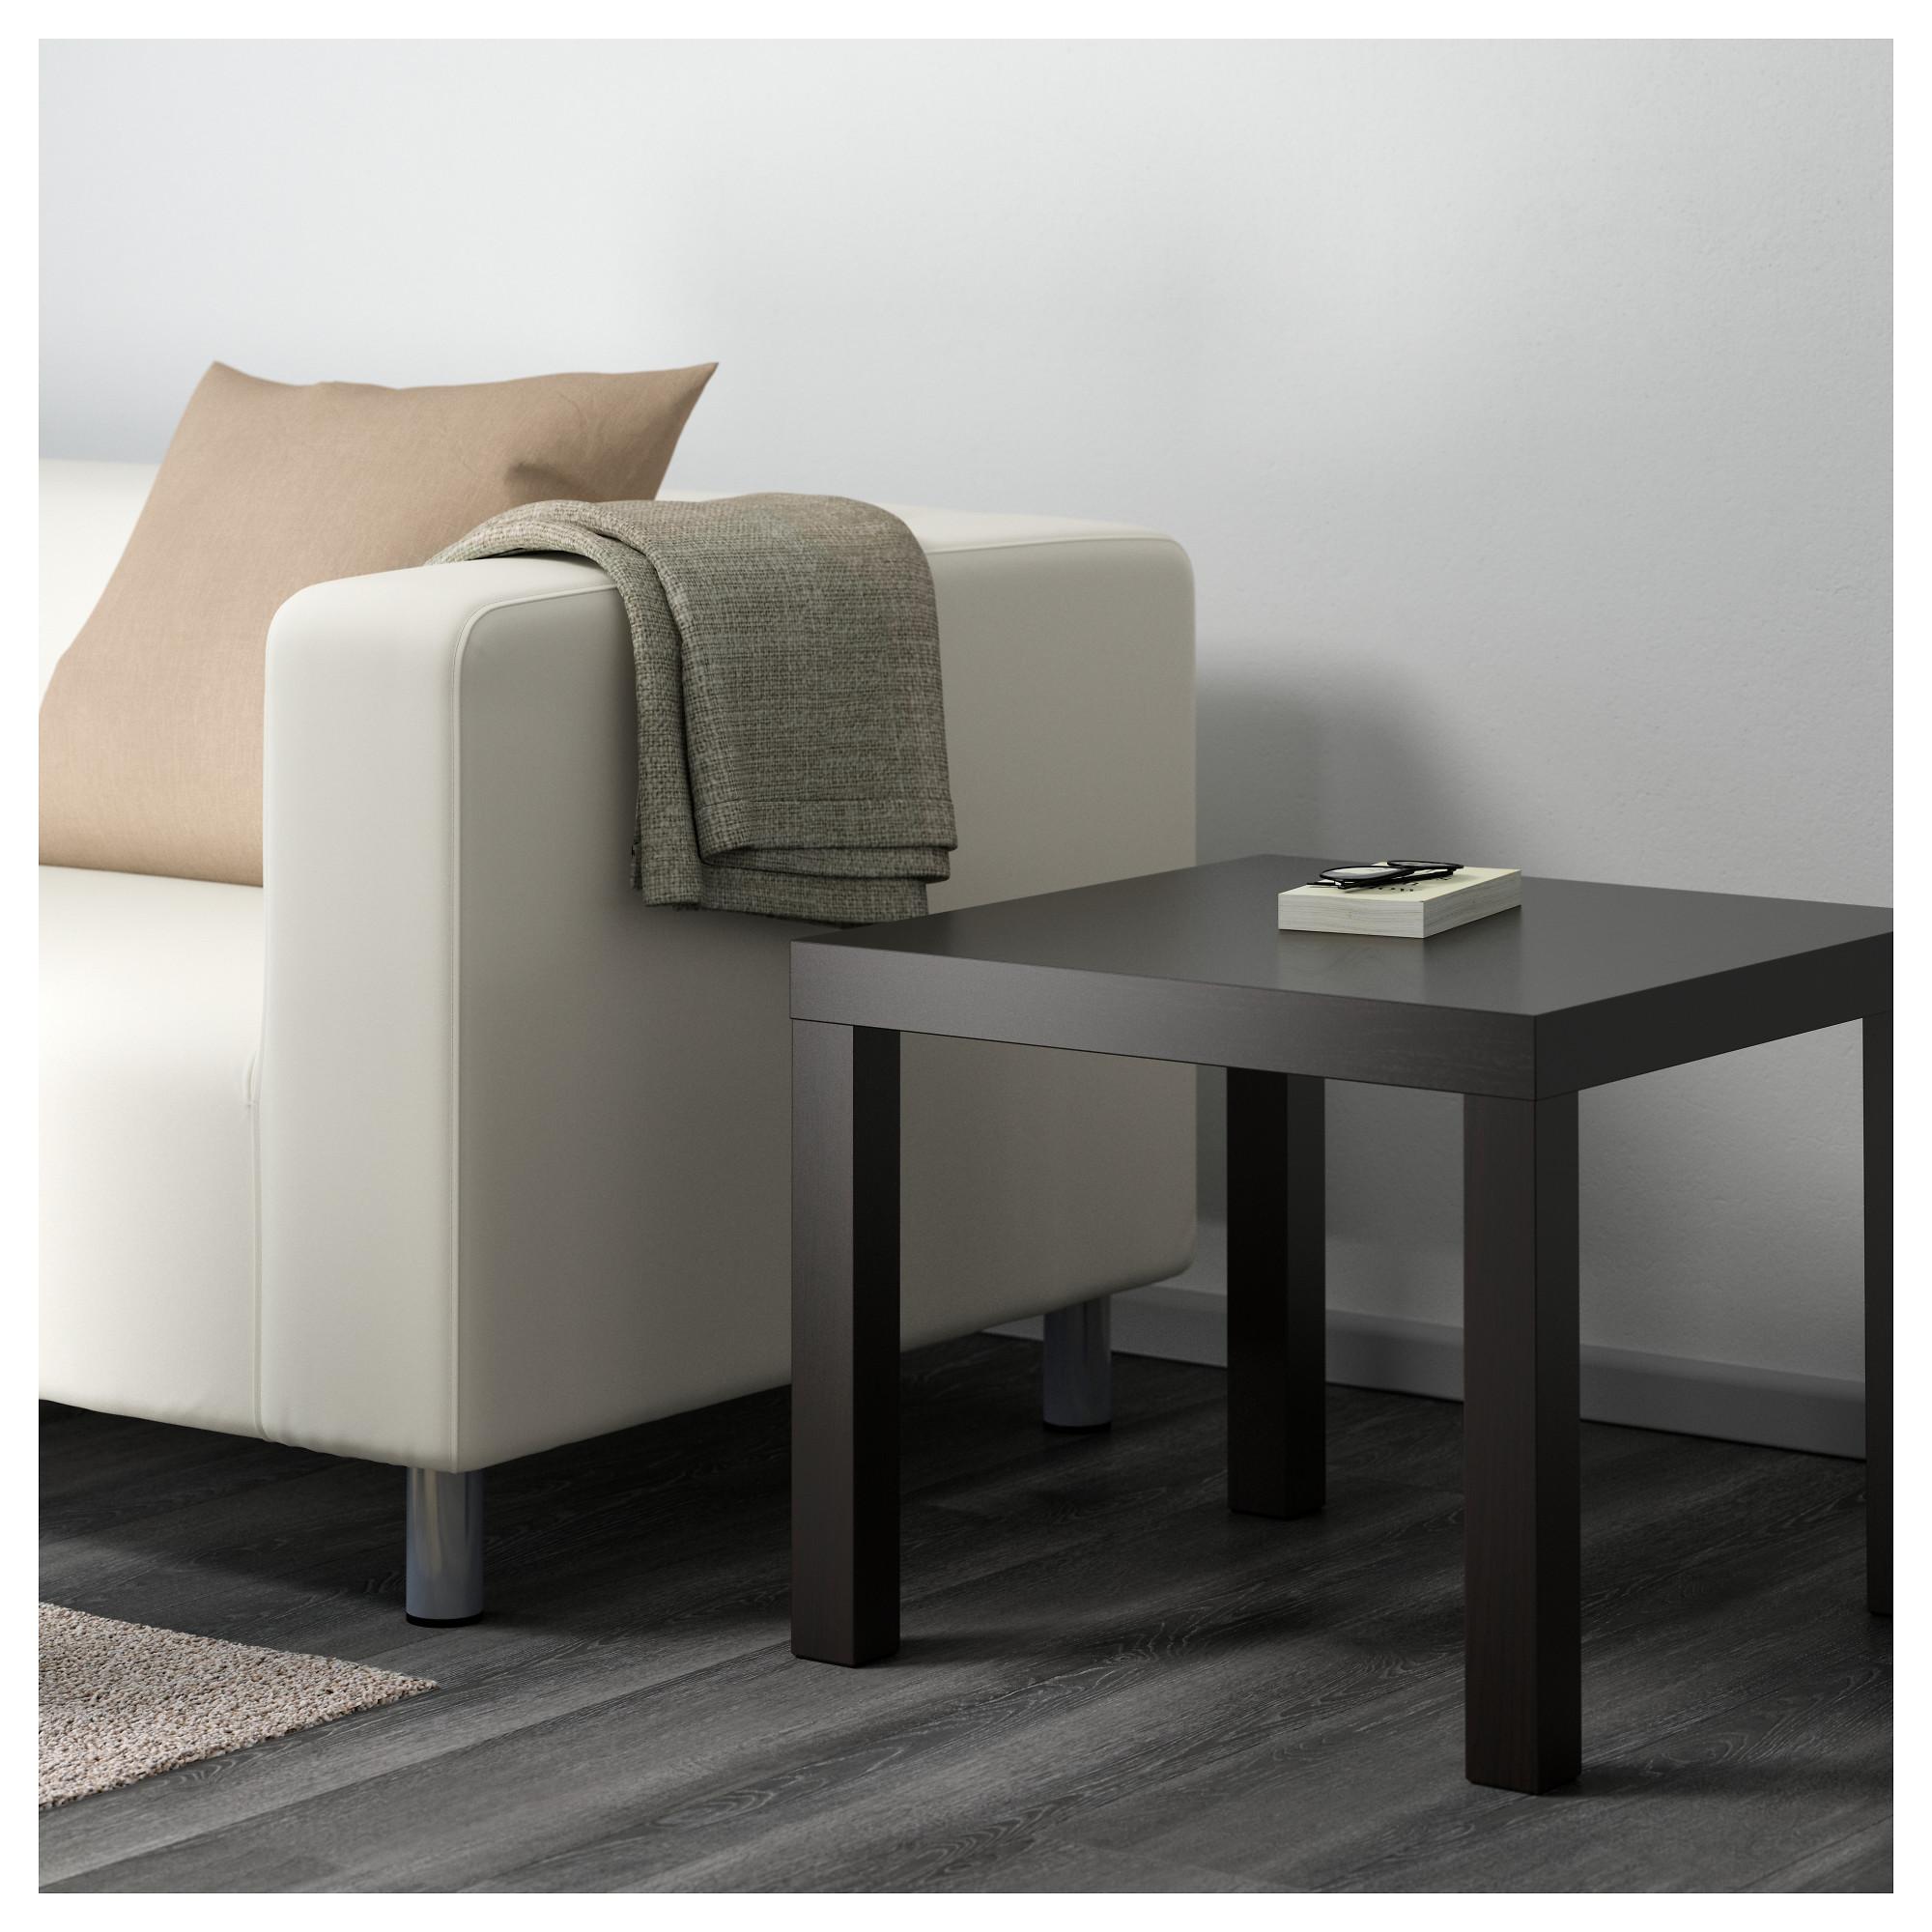 IKEA LACK Side table blackbrown Ikea lack side table